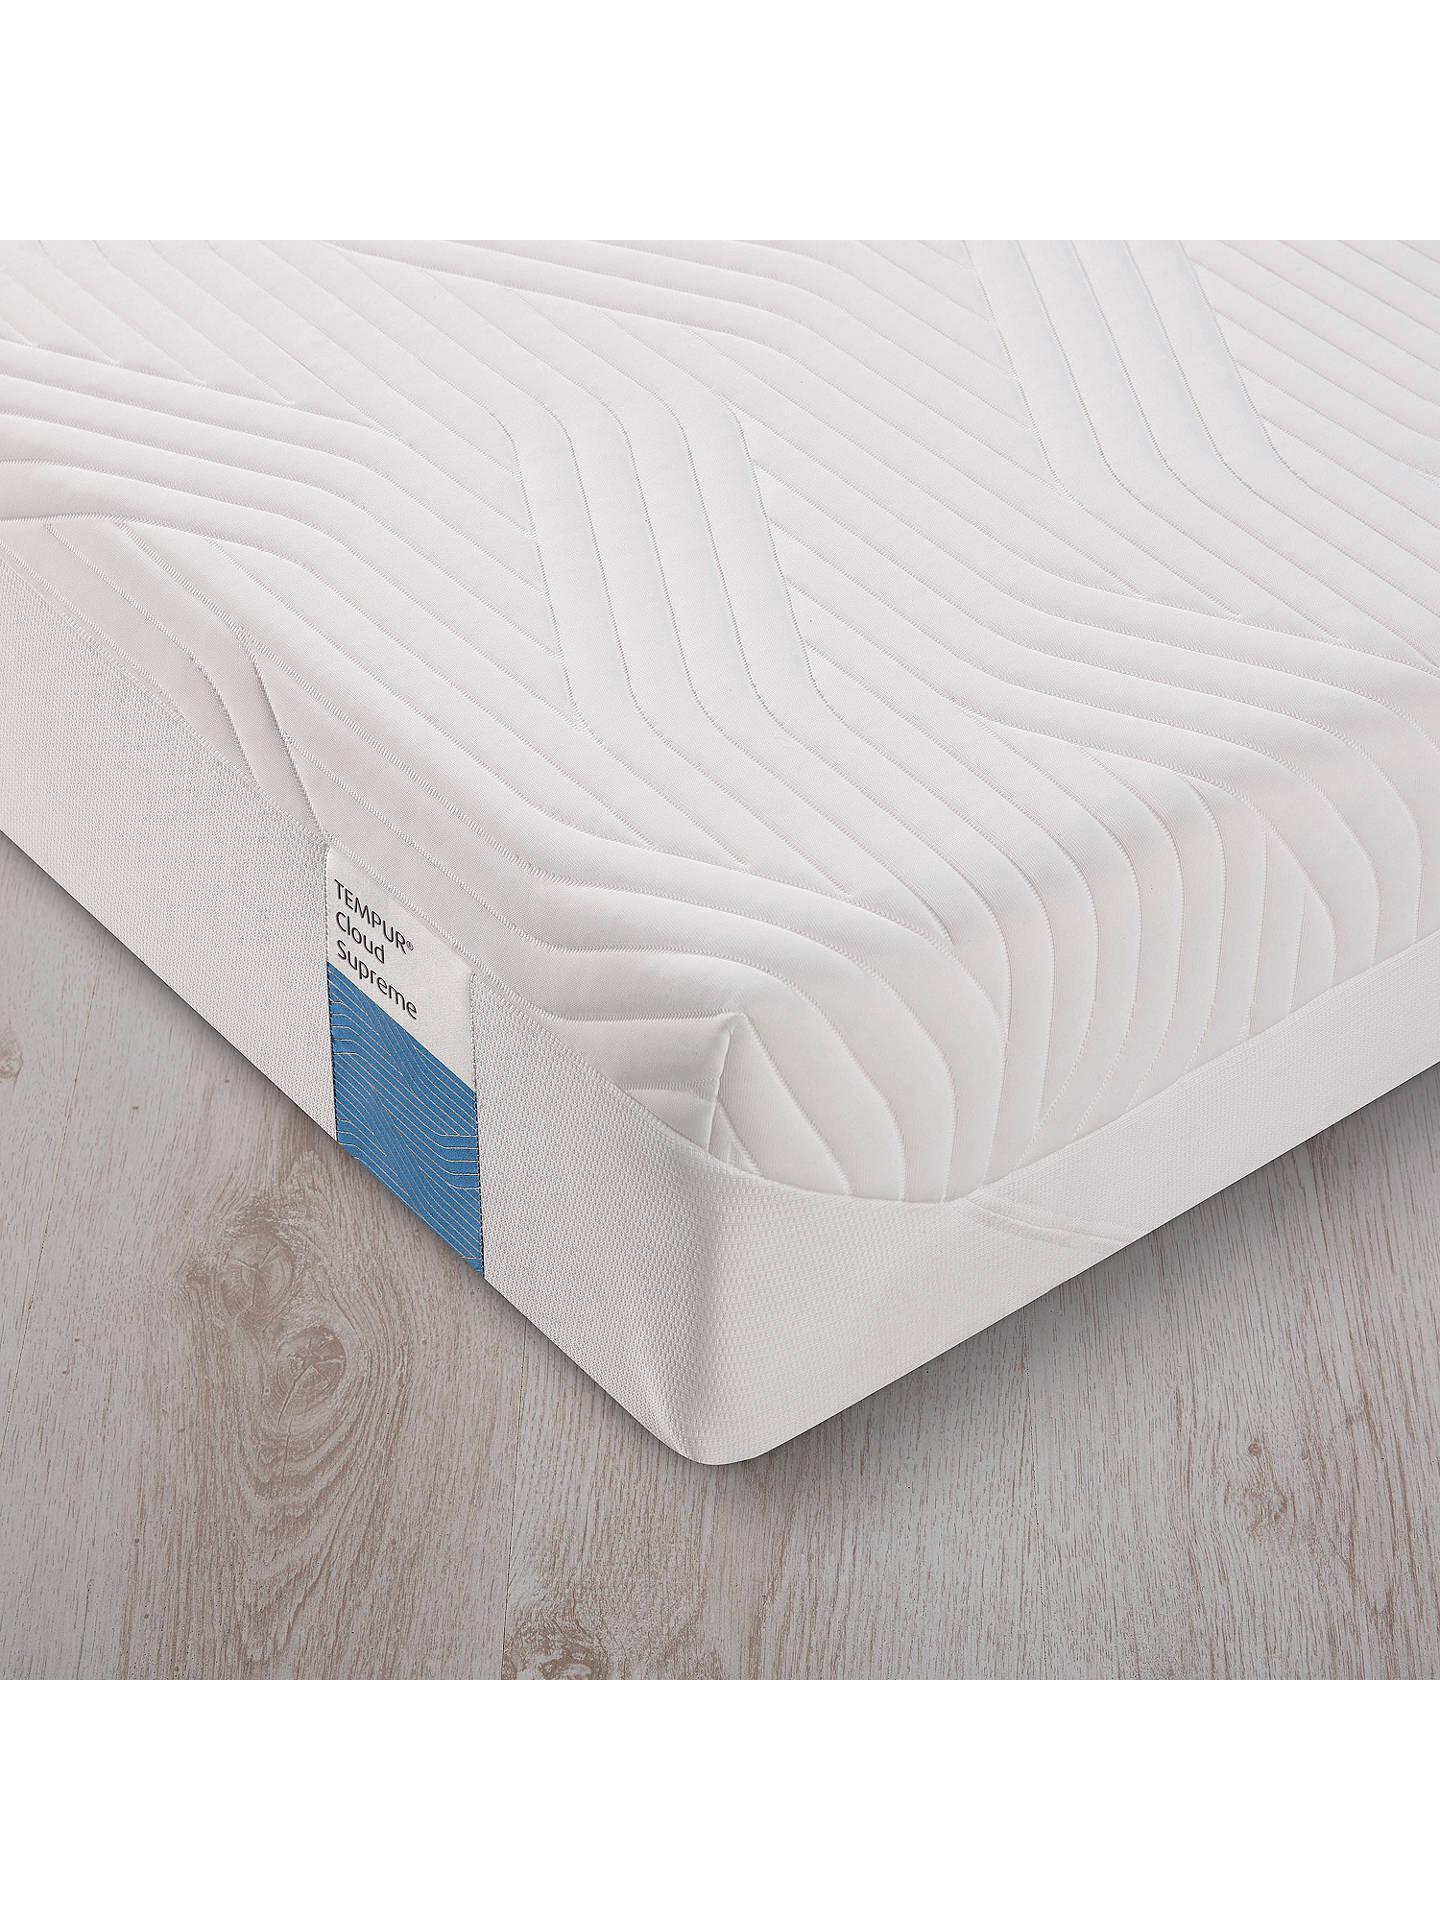 online retailer 8bd69 a2c1c Tempur Cloud Supreme 21 Memory Foam Mattress, Soft, Small Single